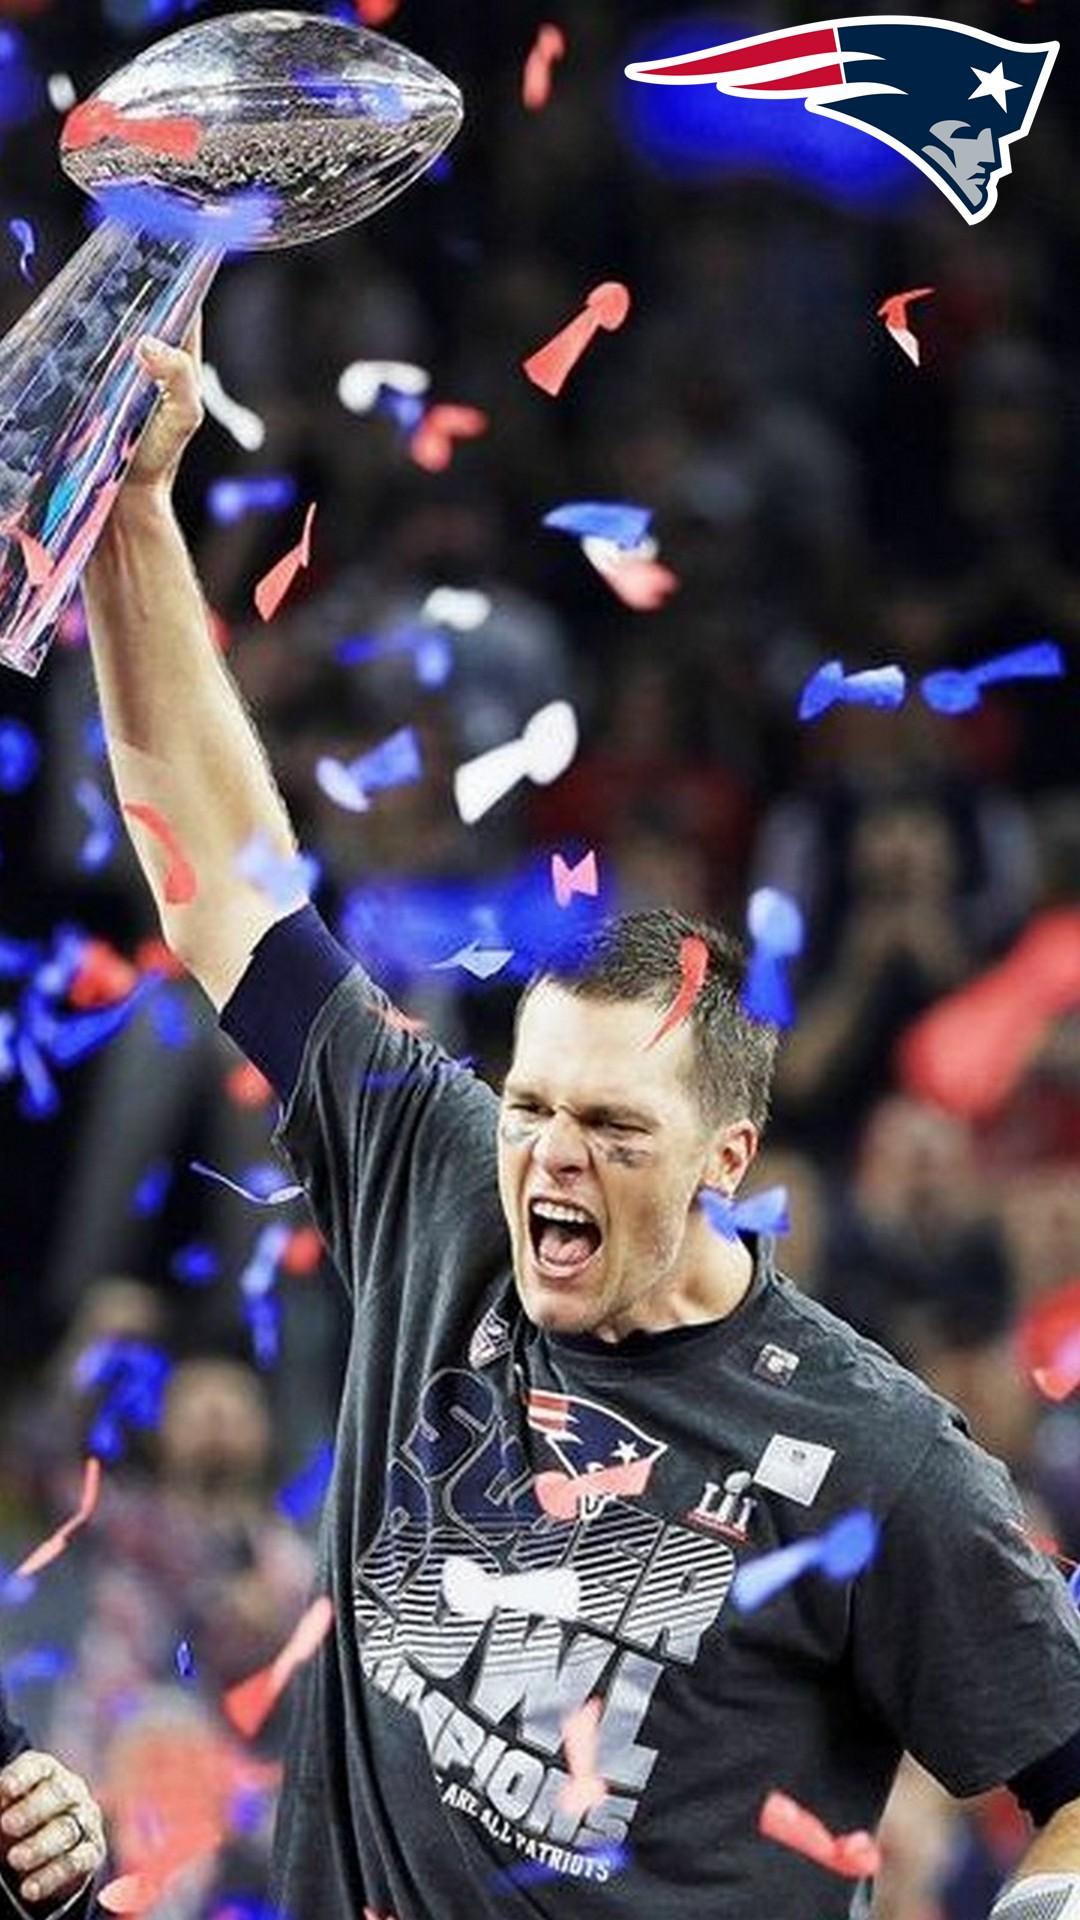 Tom Brady Goat Wallpaper iPhone HD 2020 NFL Football Wallpapers 1080x1920